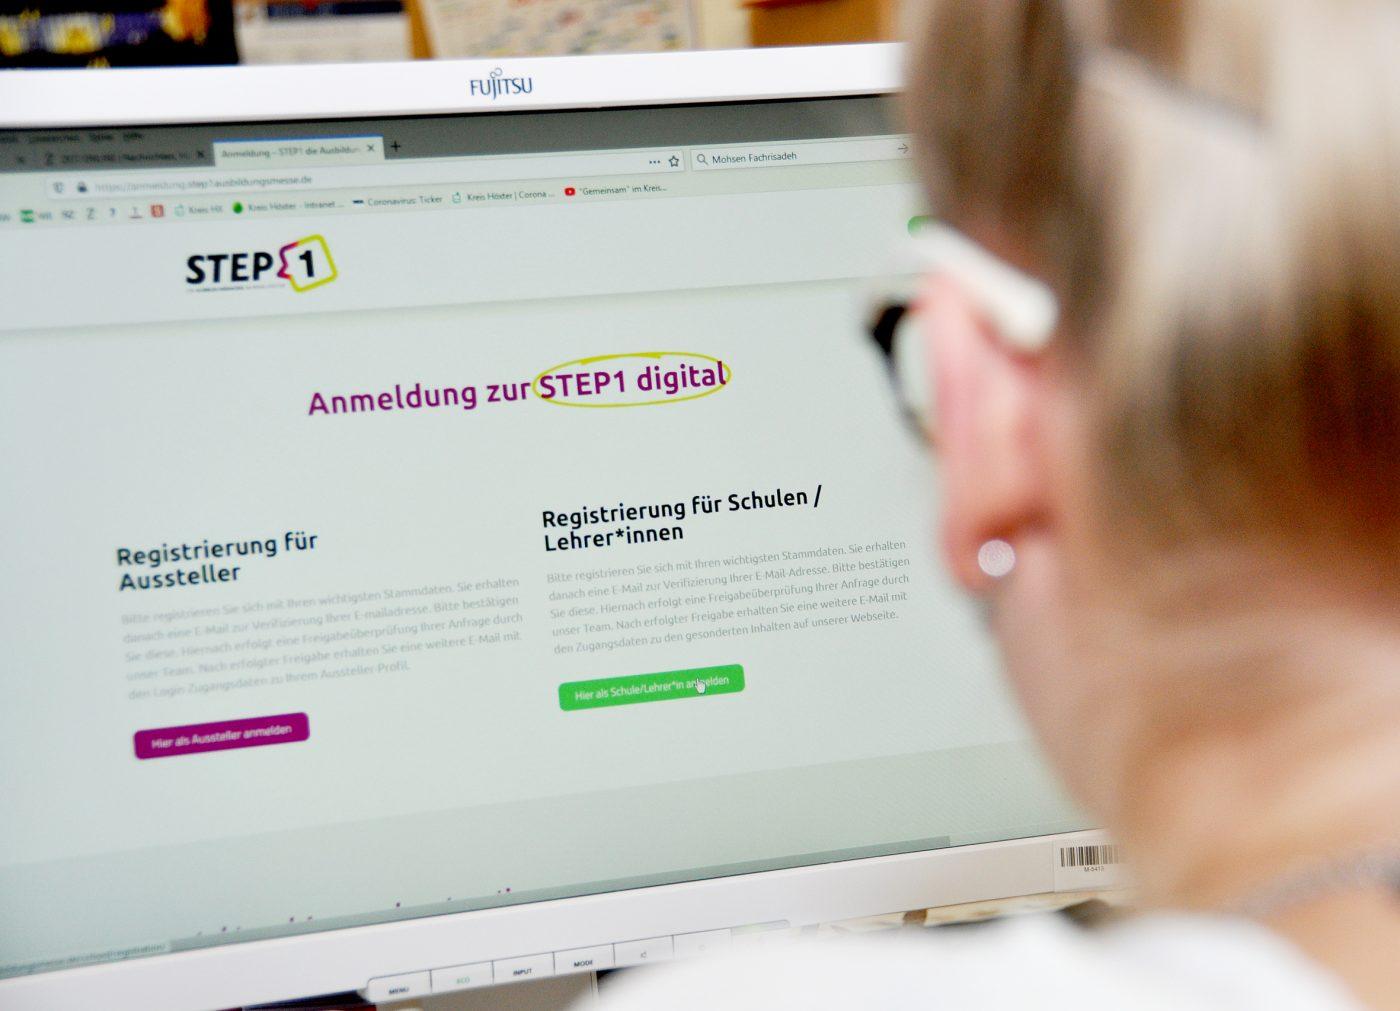 STEP1_digital